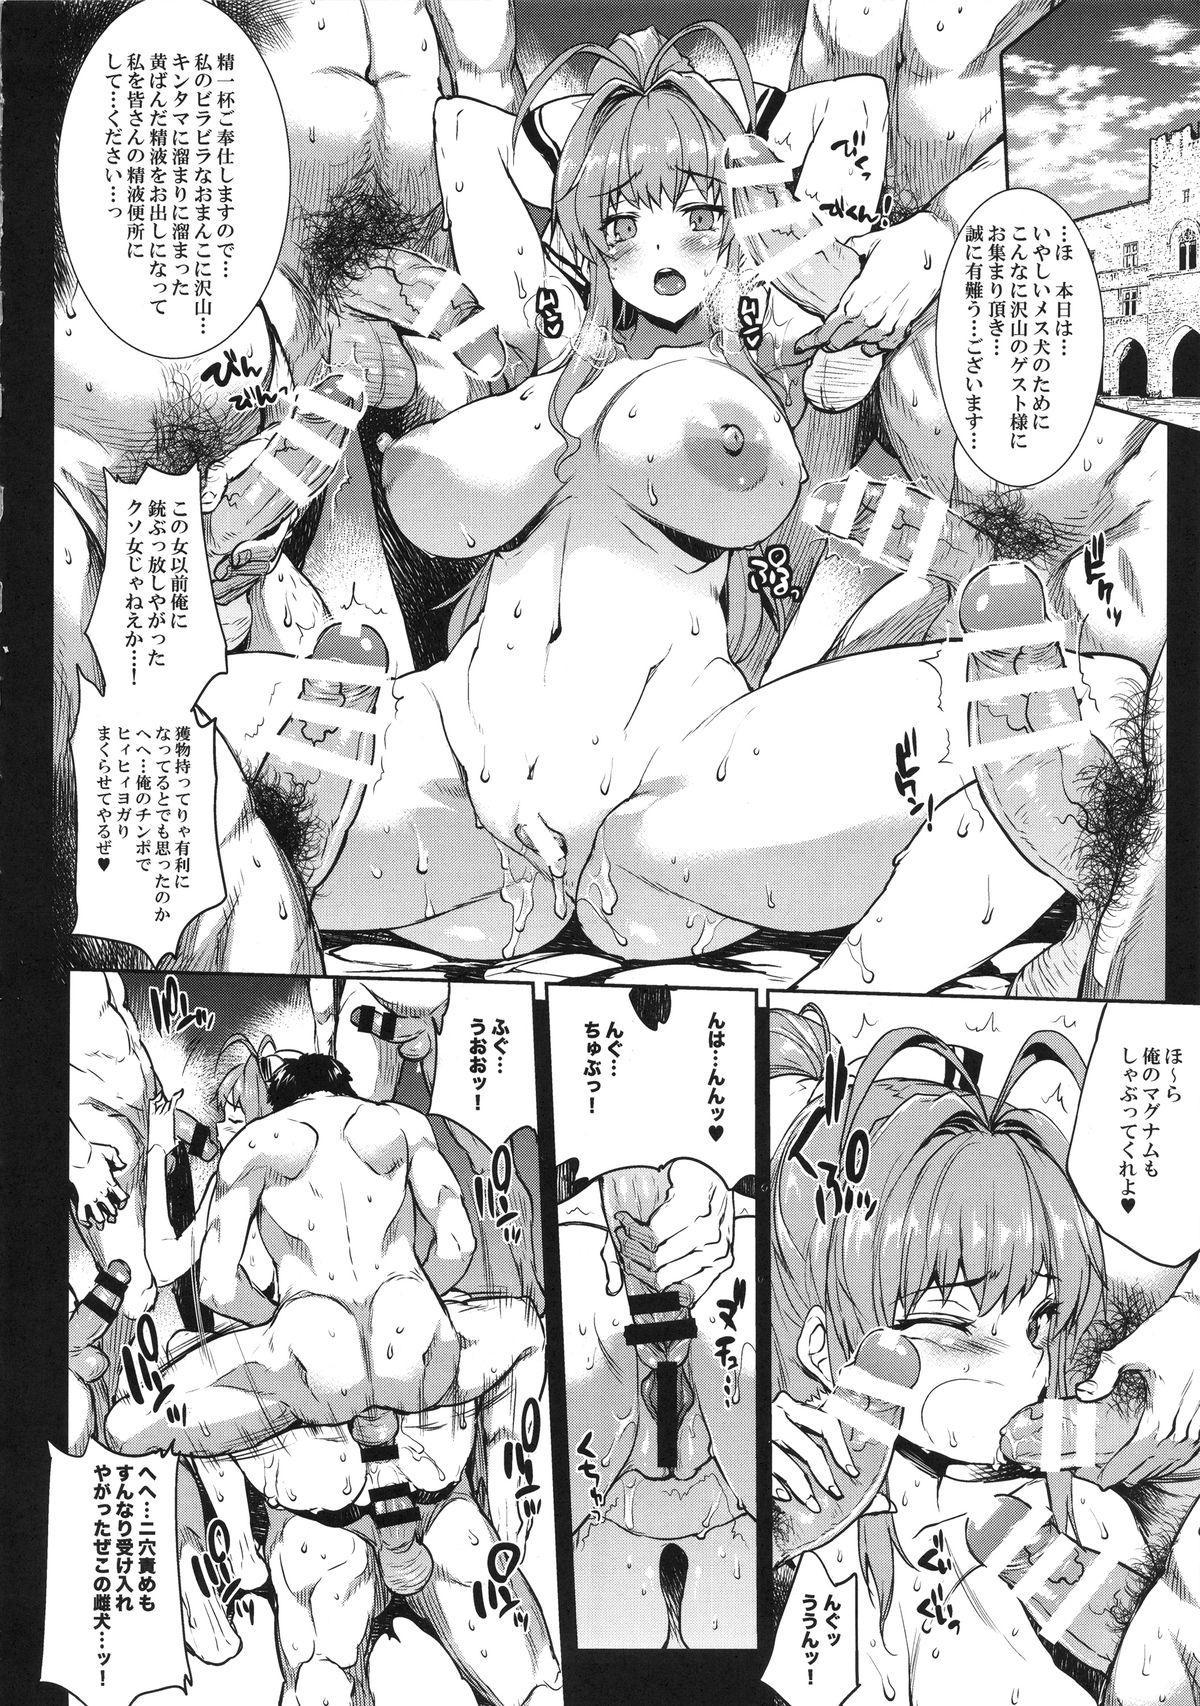 Amagi Erect Sawaru parade 18